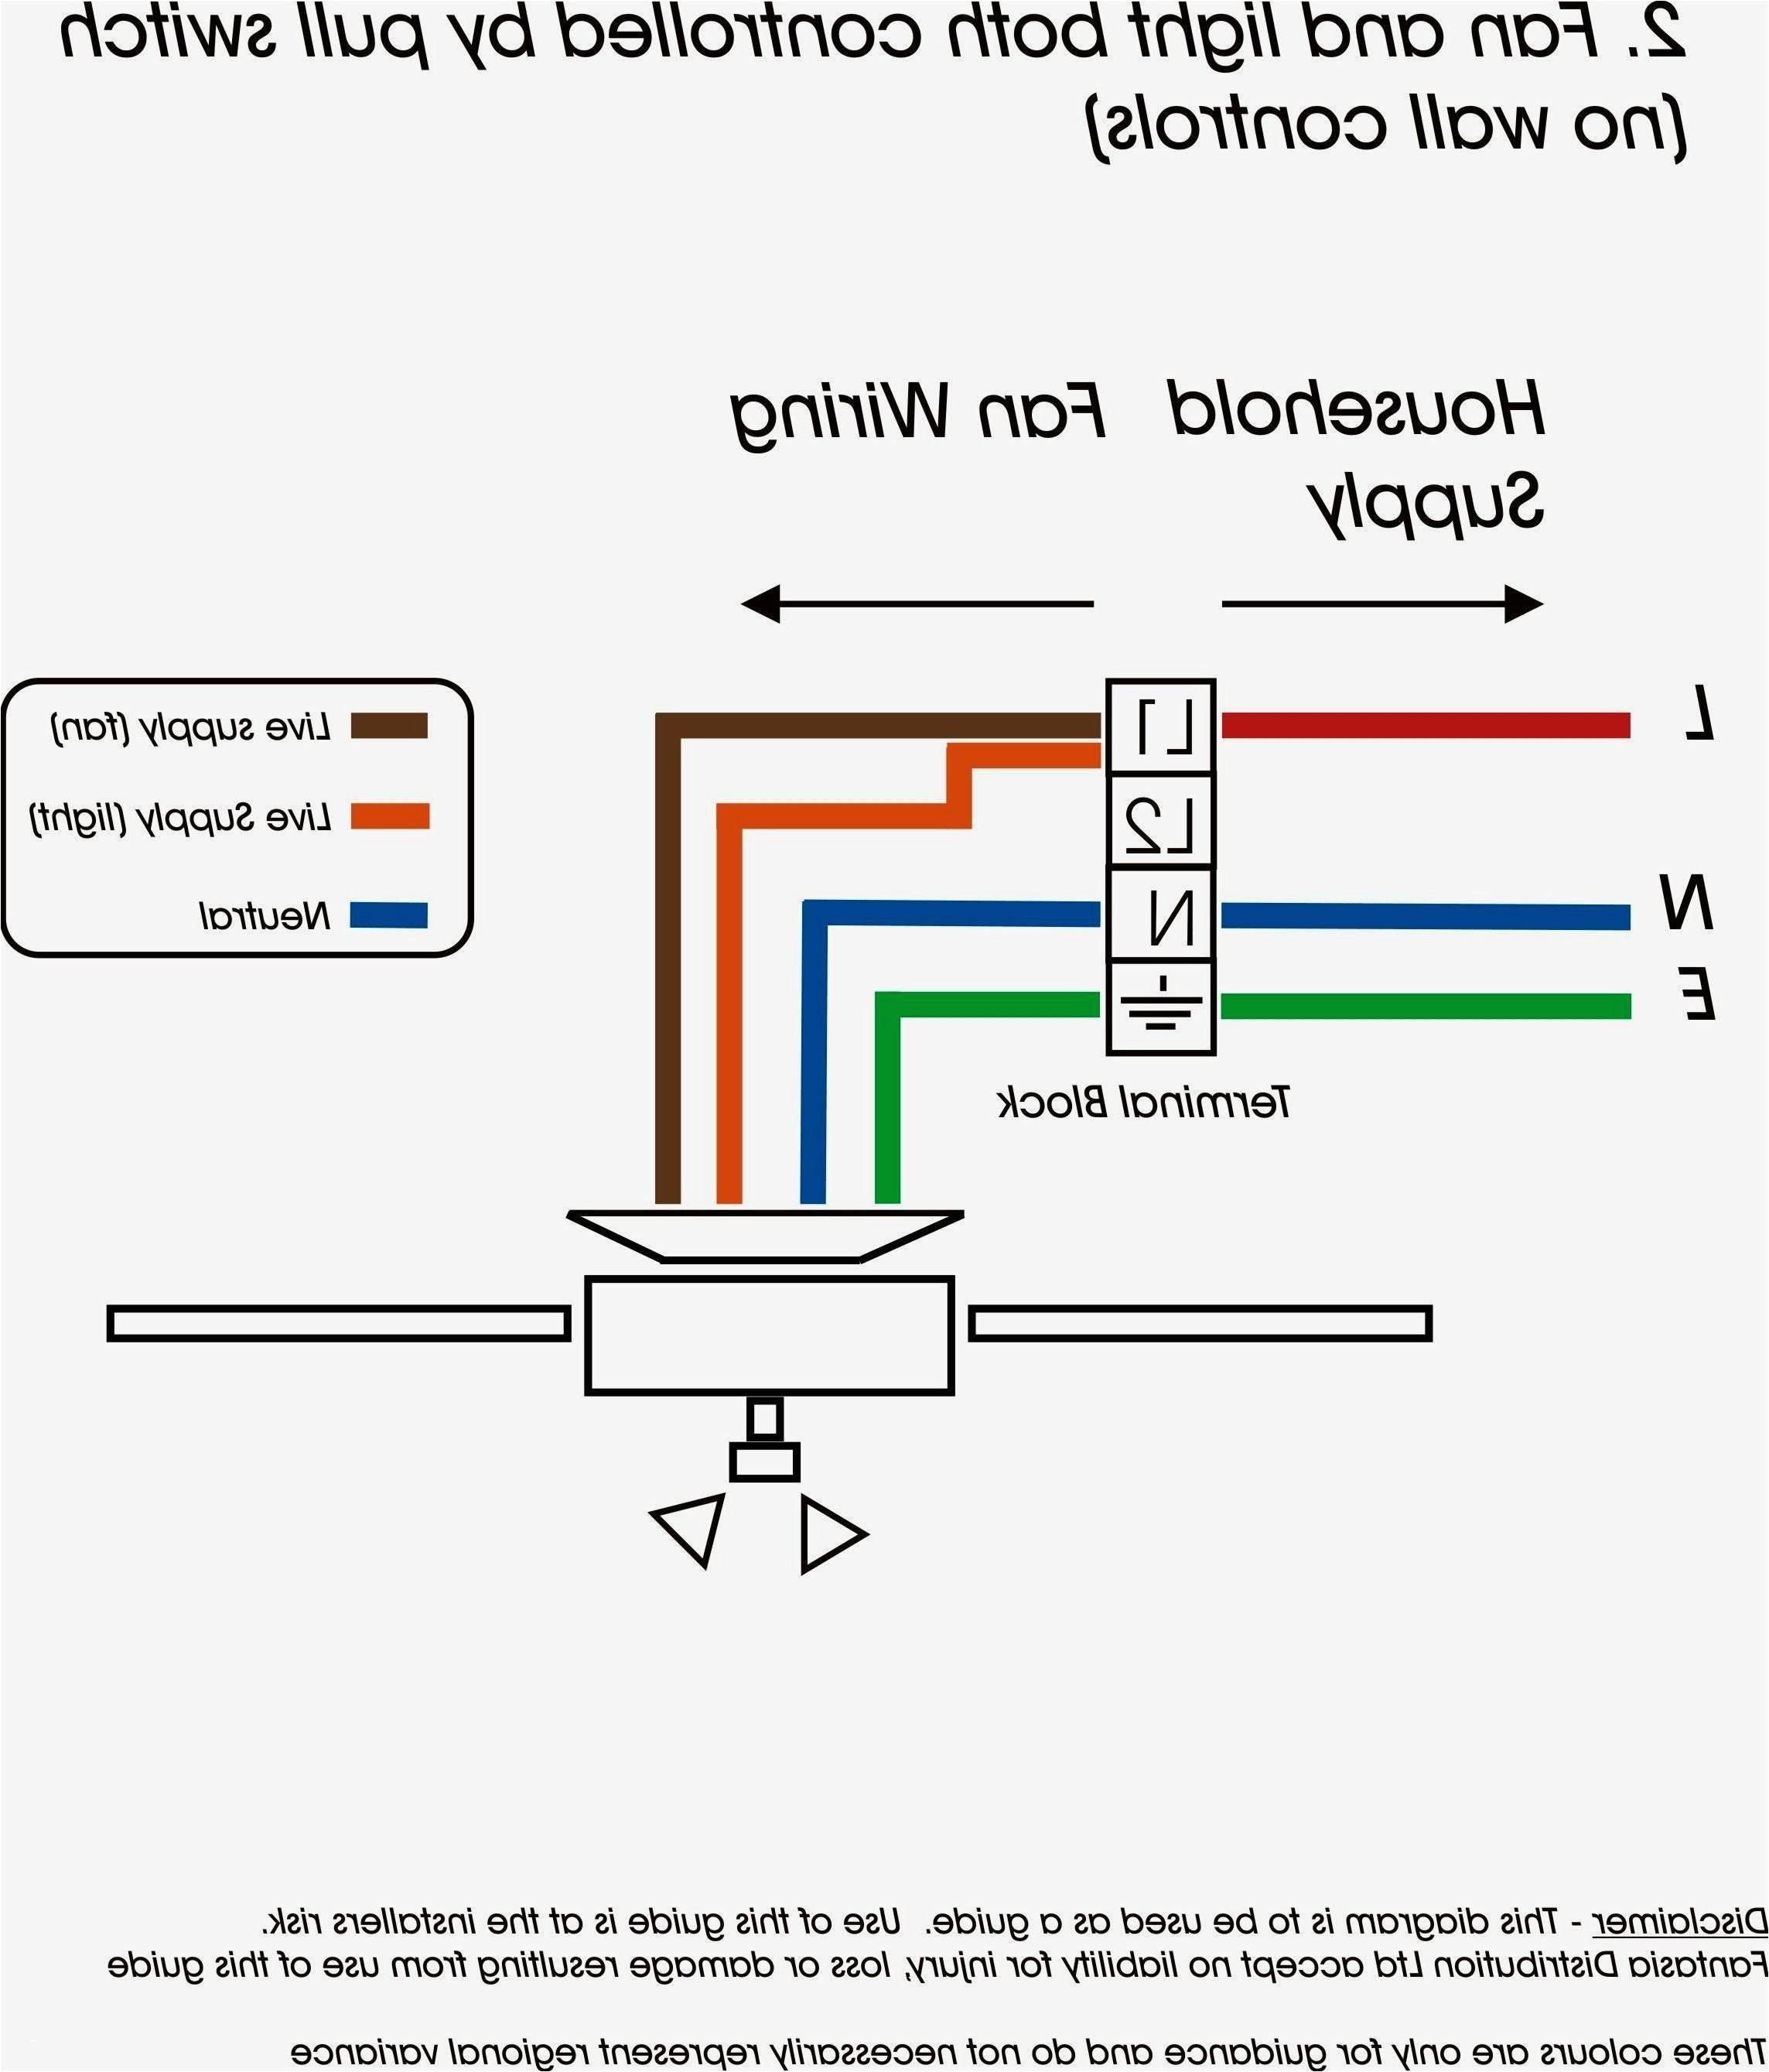 15 Amp Outlet Wiring Diagram 20amp 3 Phase Plug Wiring Diagram Schema Diagram Database